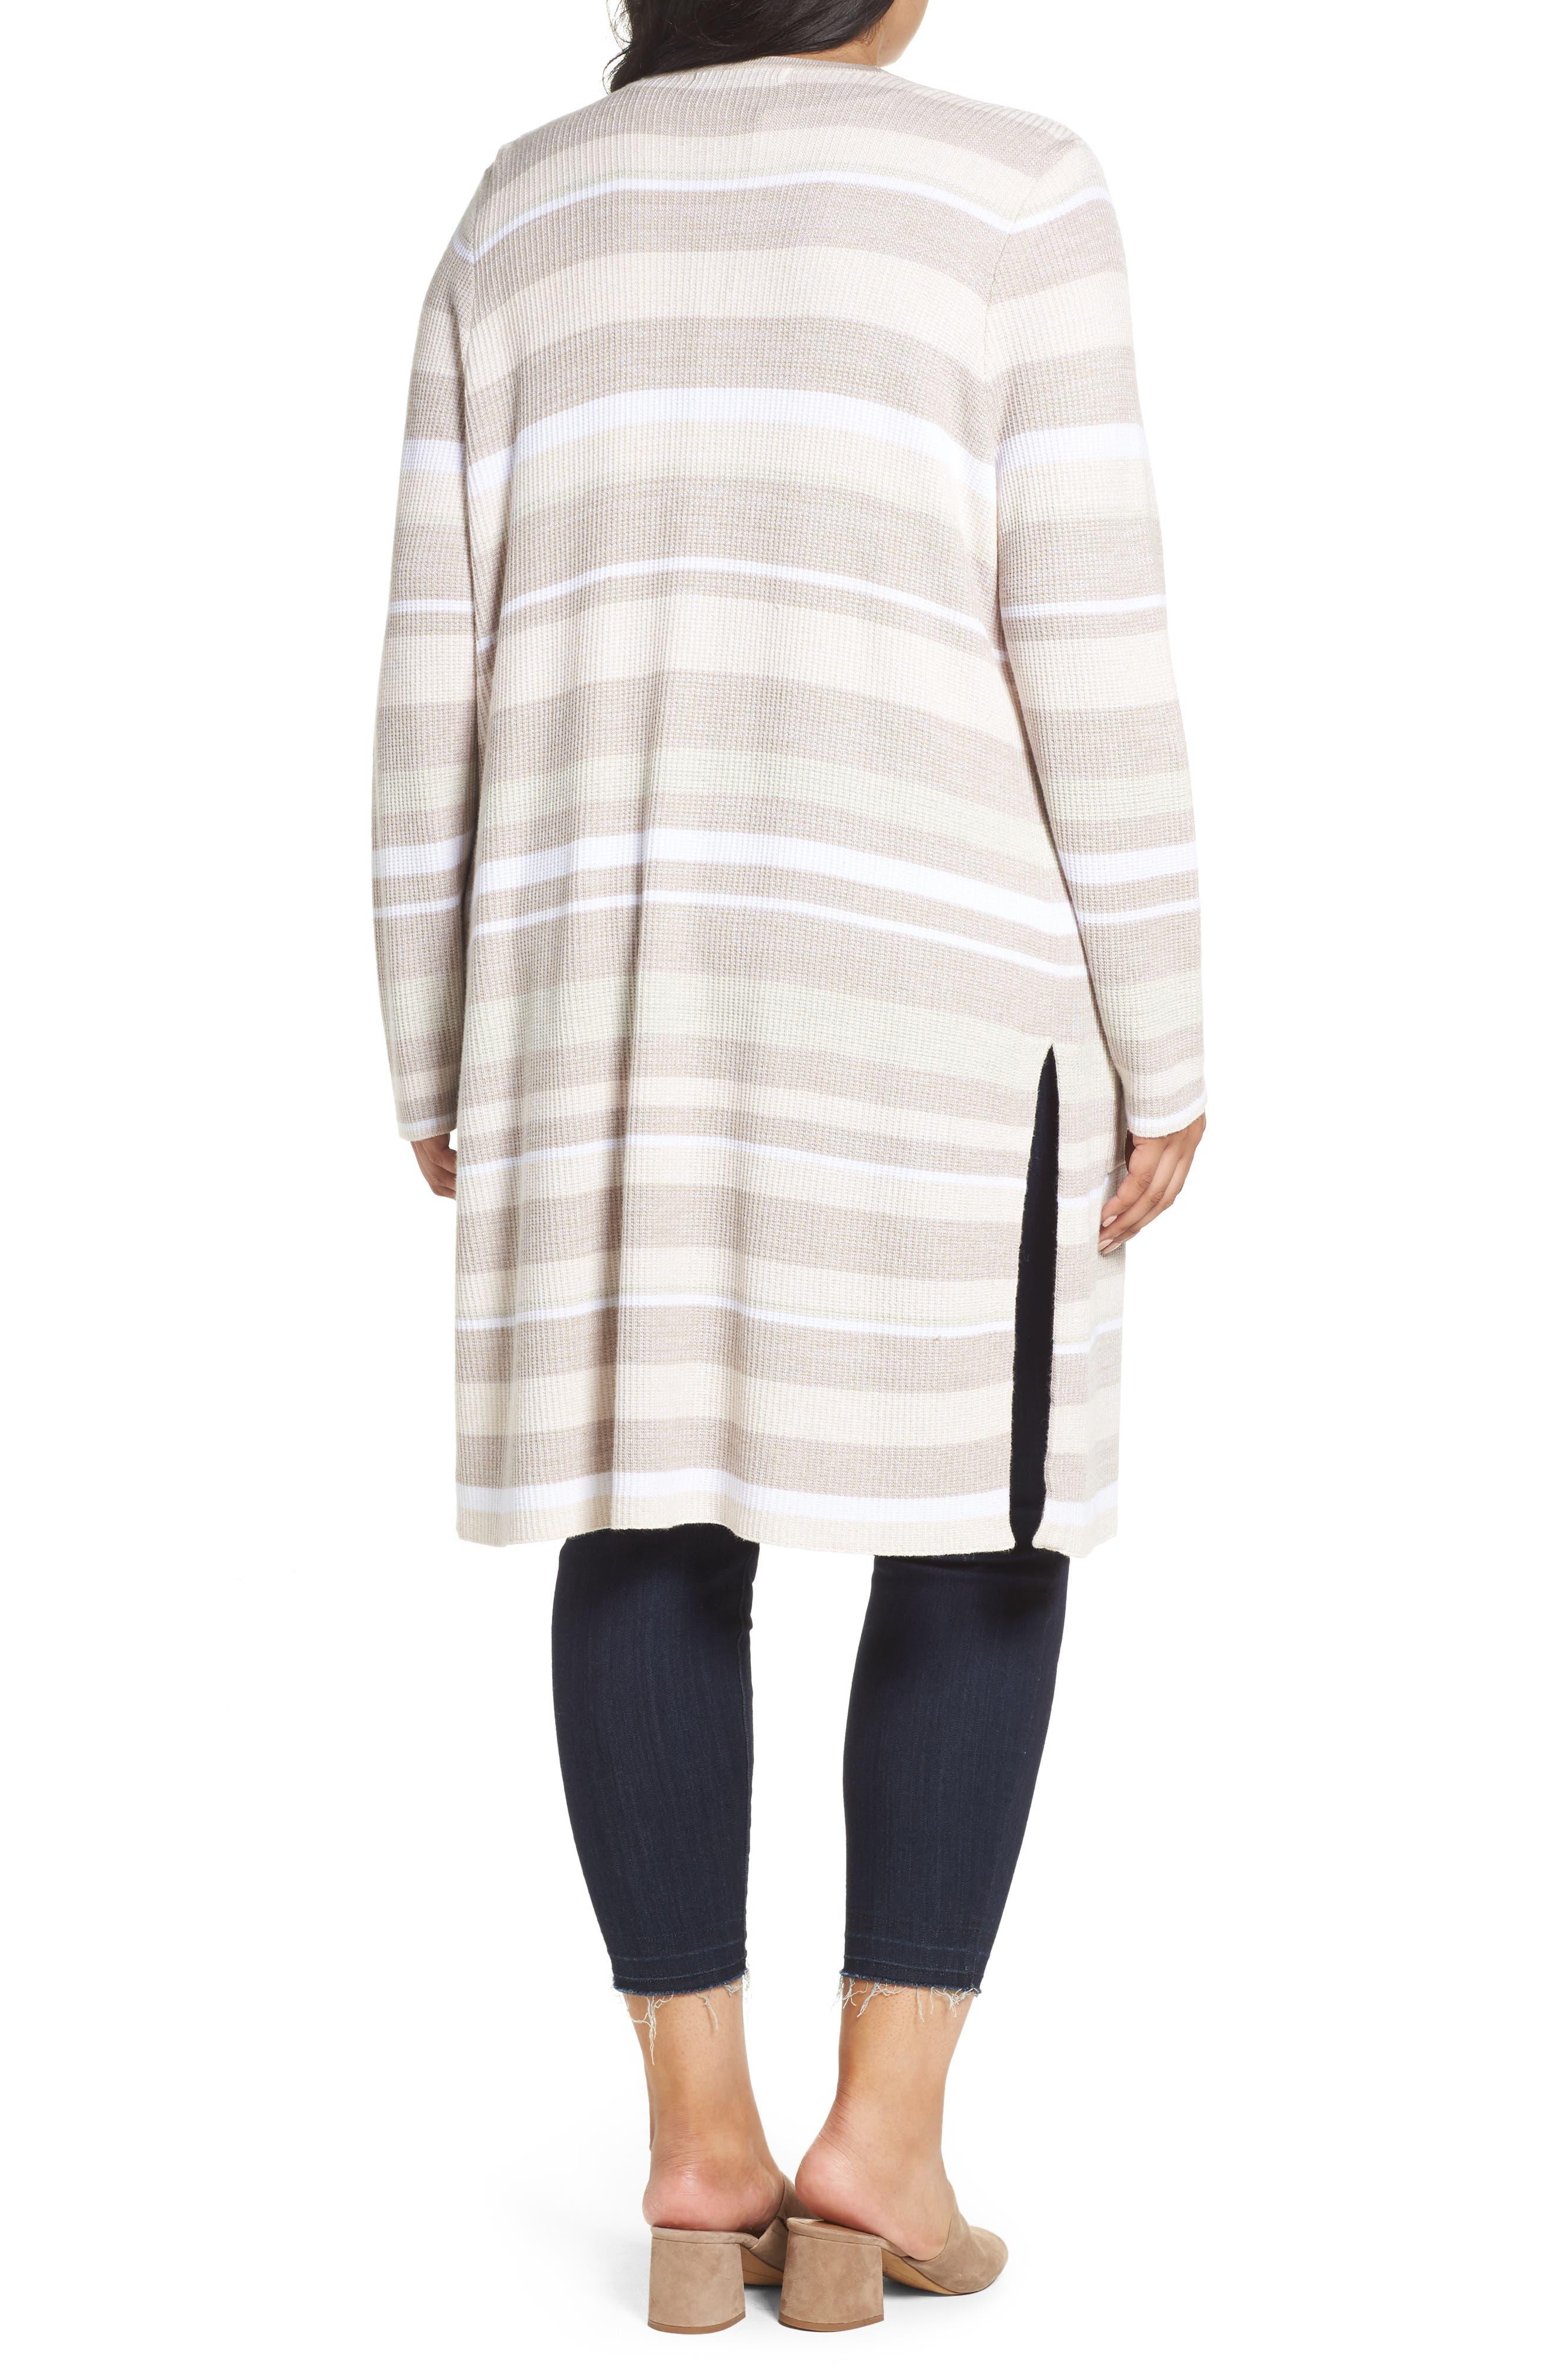 Alternate Image 2  - Foxcroft Rhona Textured Stripe Longline Cardigan (Plus Size)